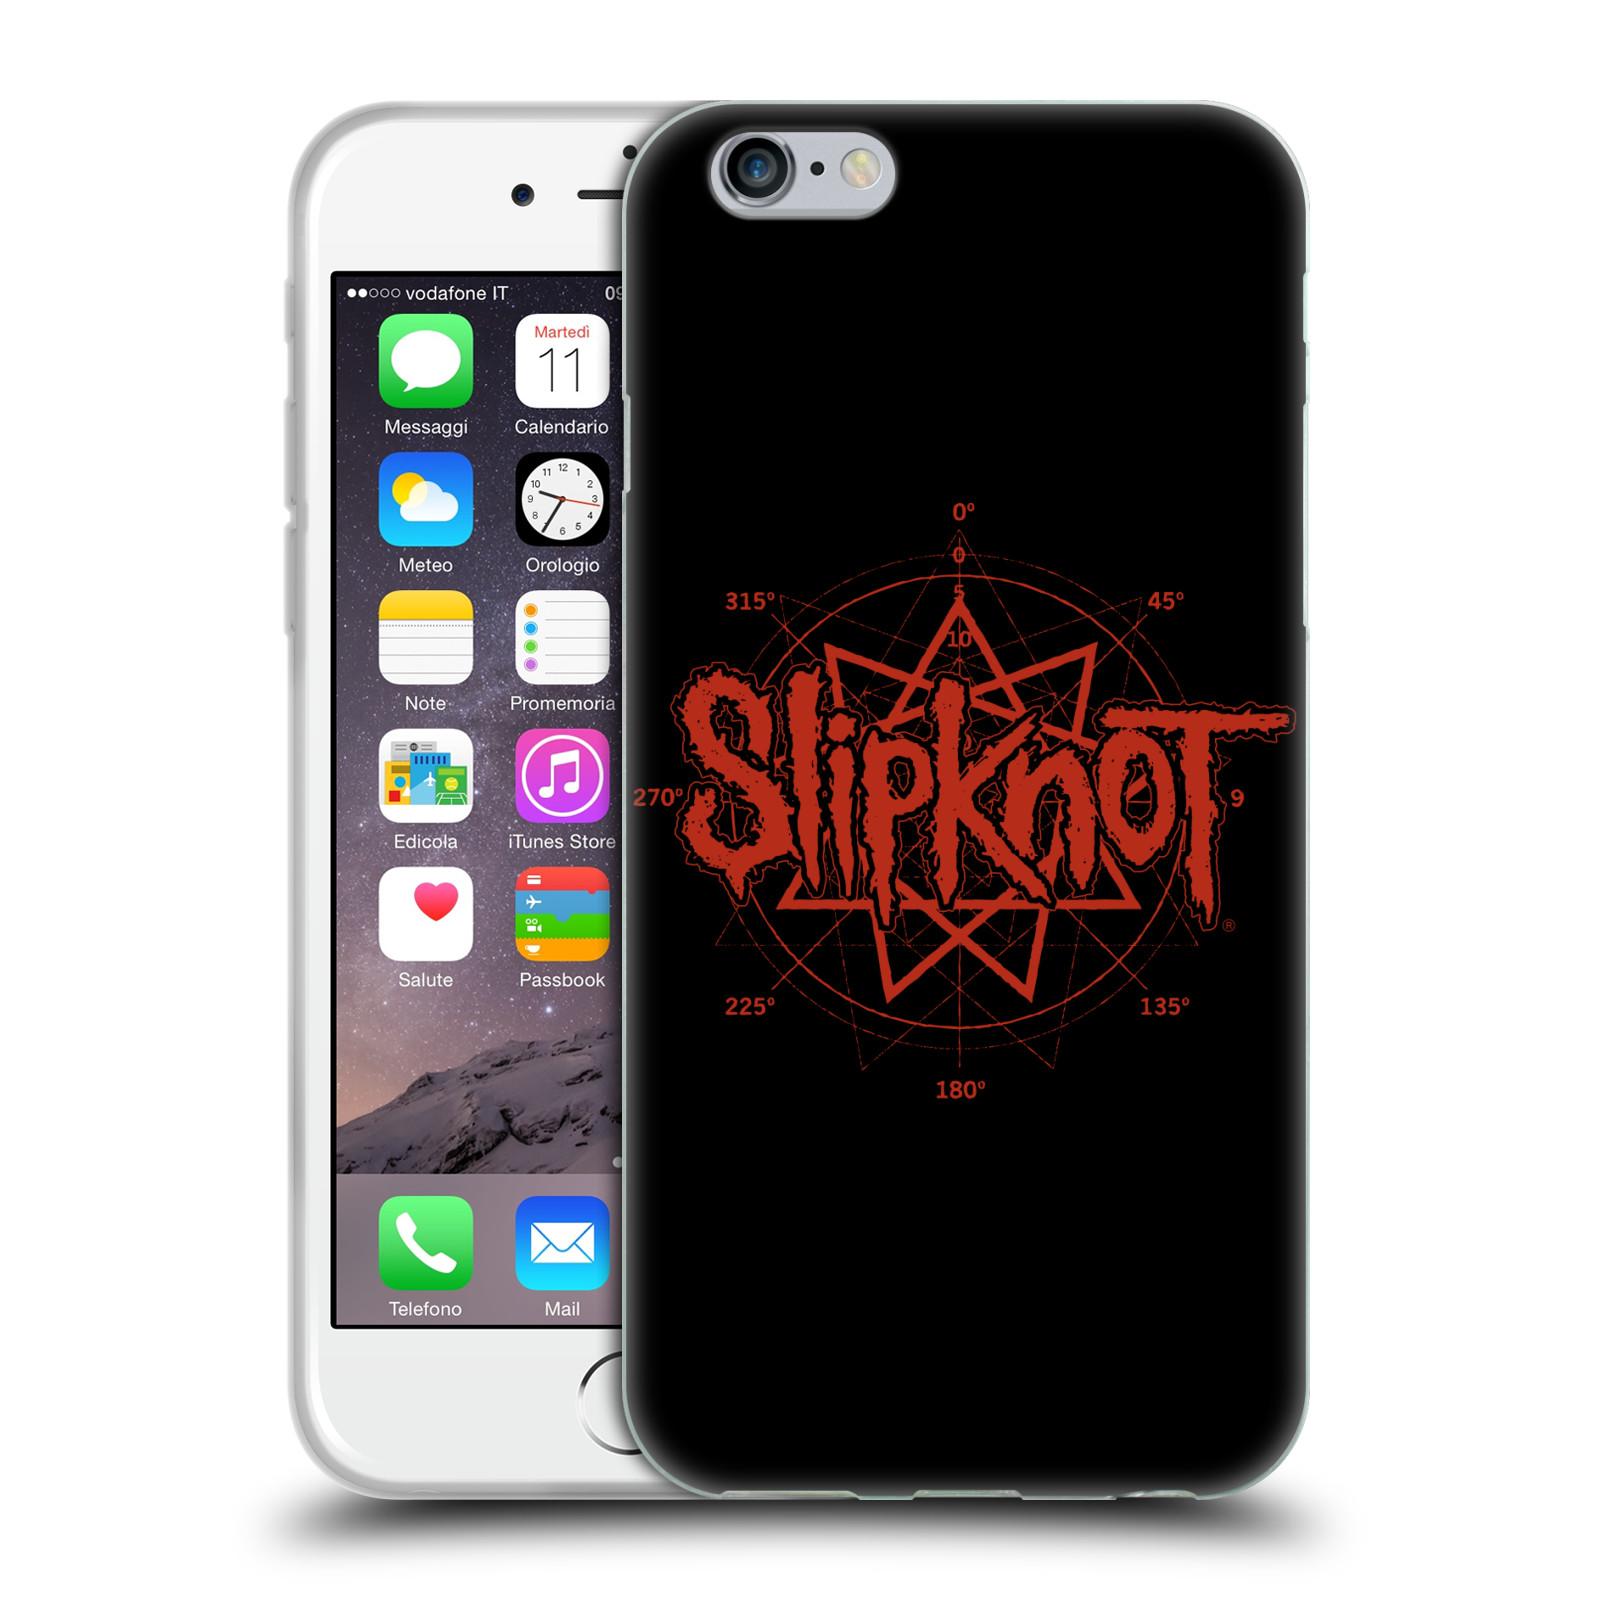 HEAD CASE silikonový obal na mobil Apple Iphone 6/6S hudební skupina Slipknot logo